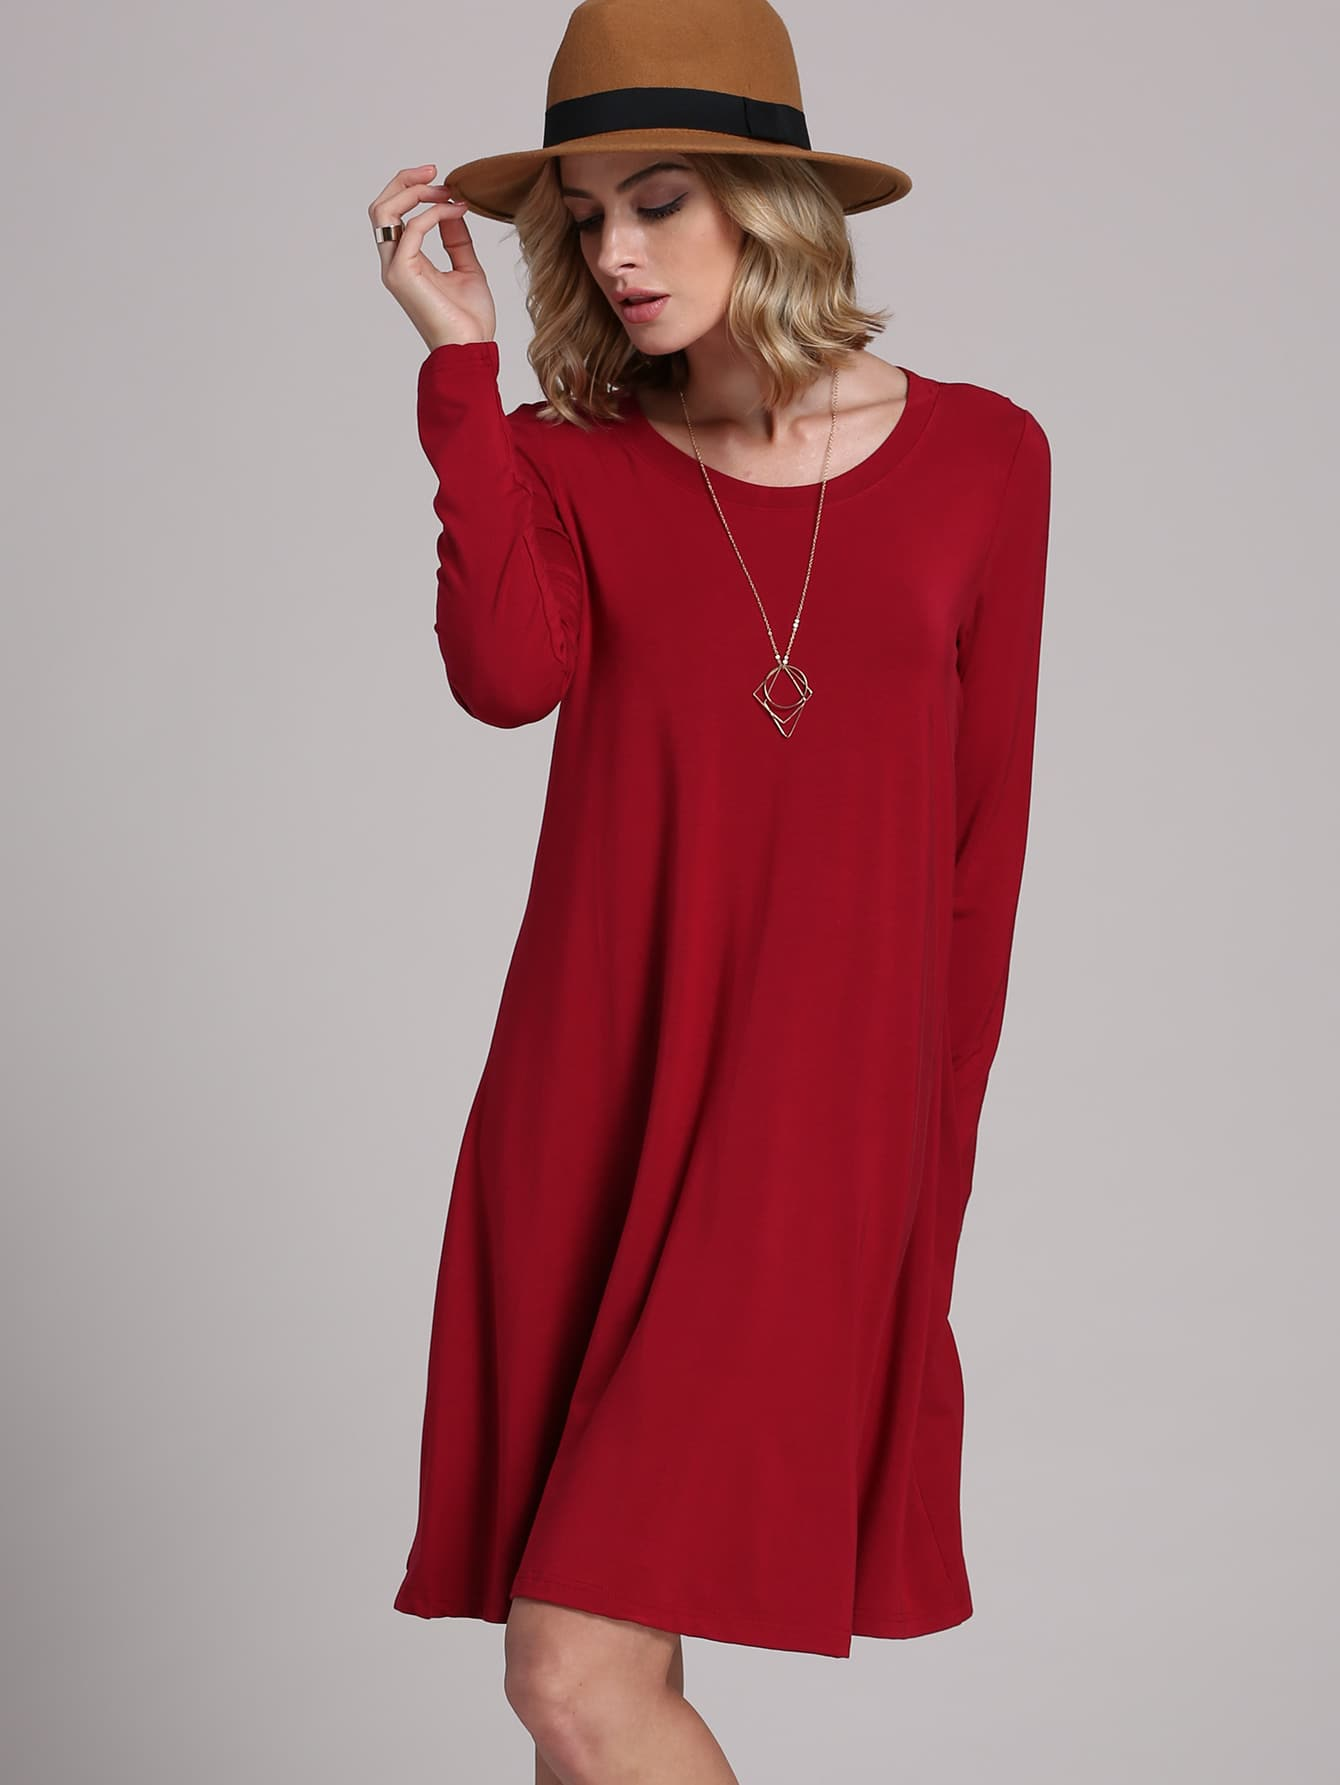 Long Sleeve Casual Babydoll Dress